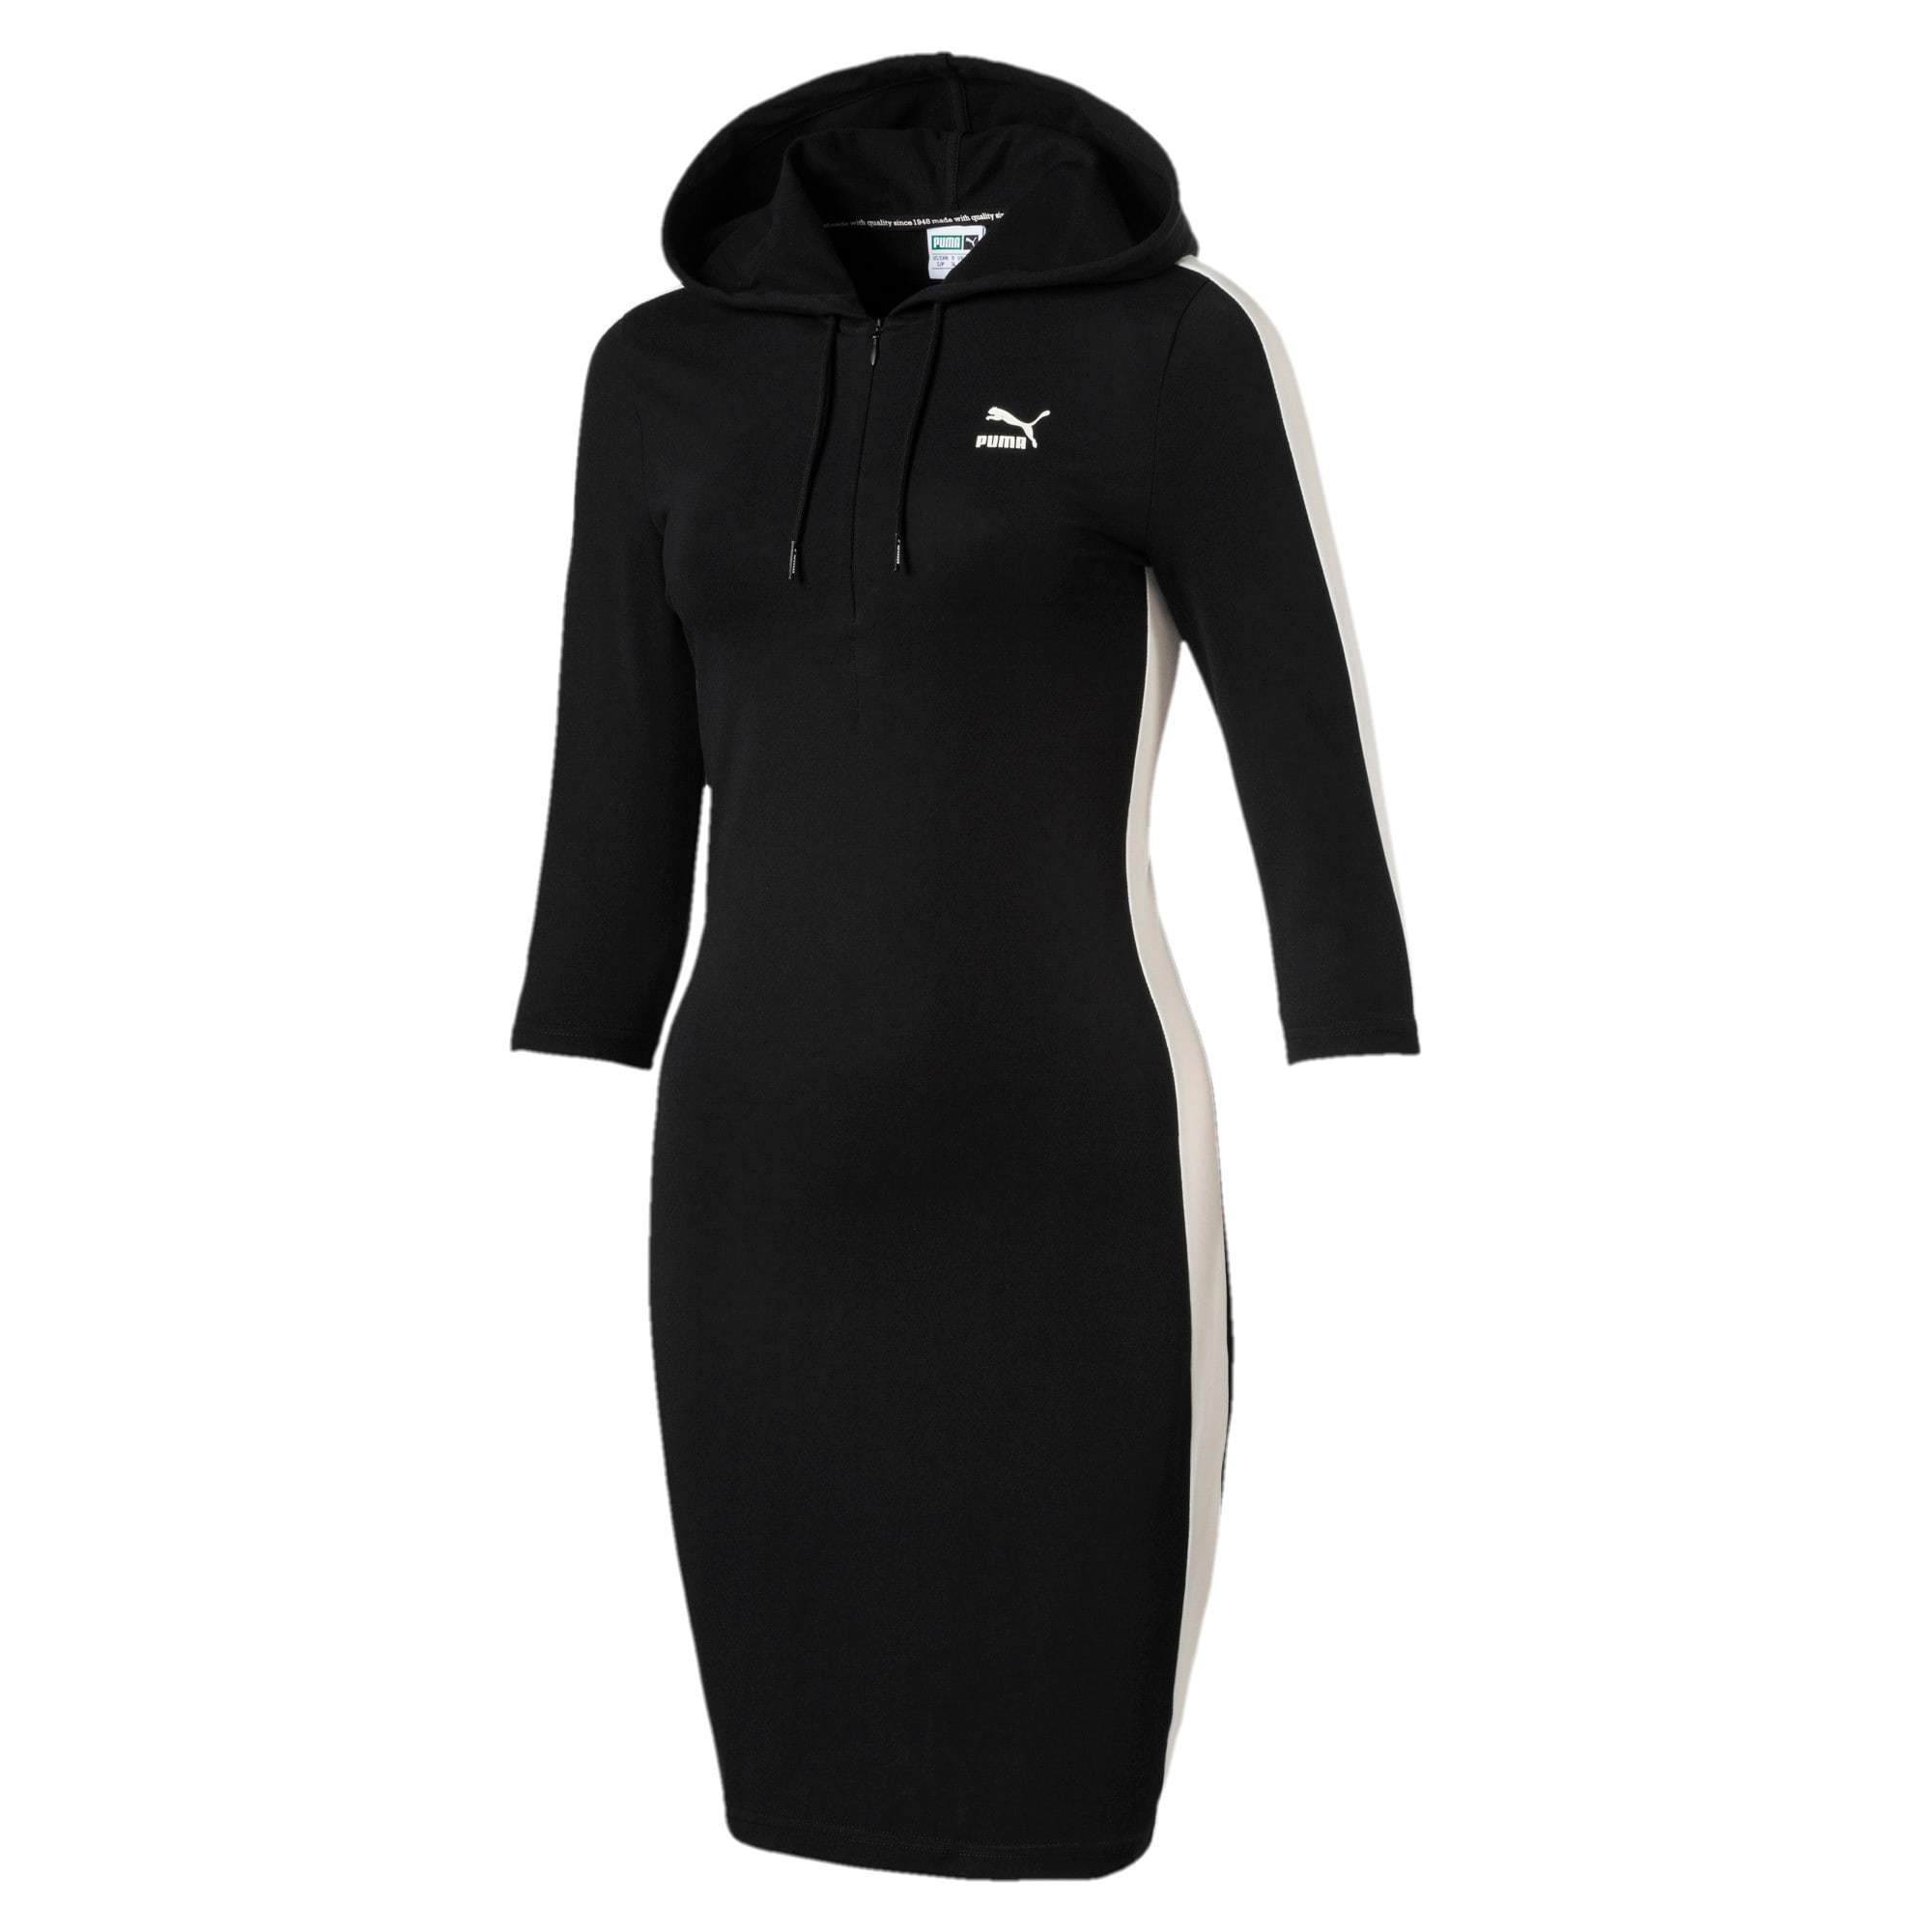 Thumbnail 1 of Archive Women's T7 Dress, Puma Black, medium-IND